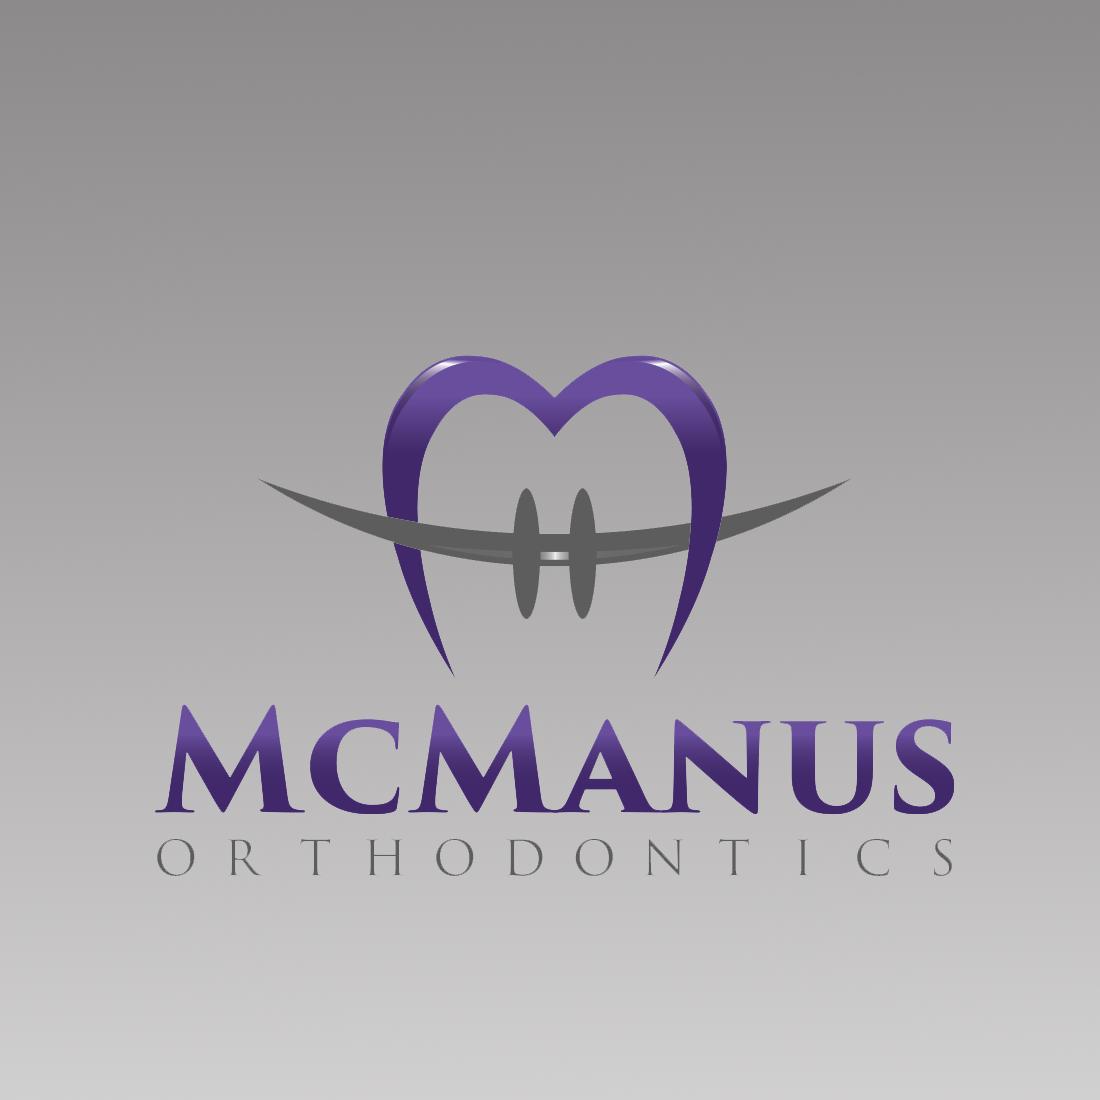 McManus Orthodontics - Rock Island, IL - Dentists & Dental Services